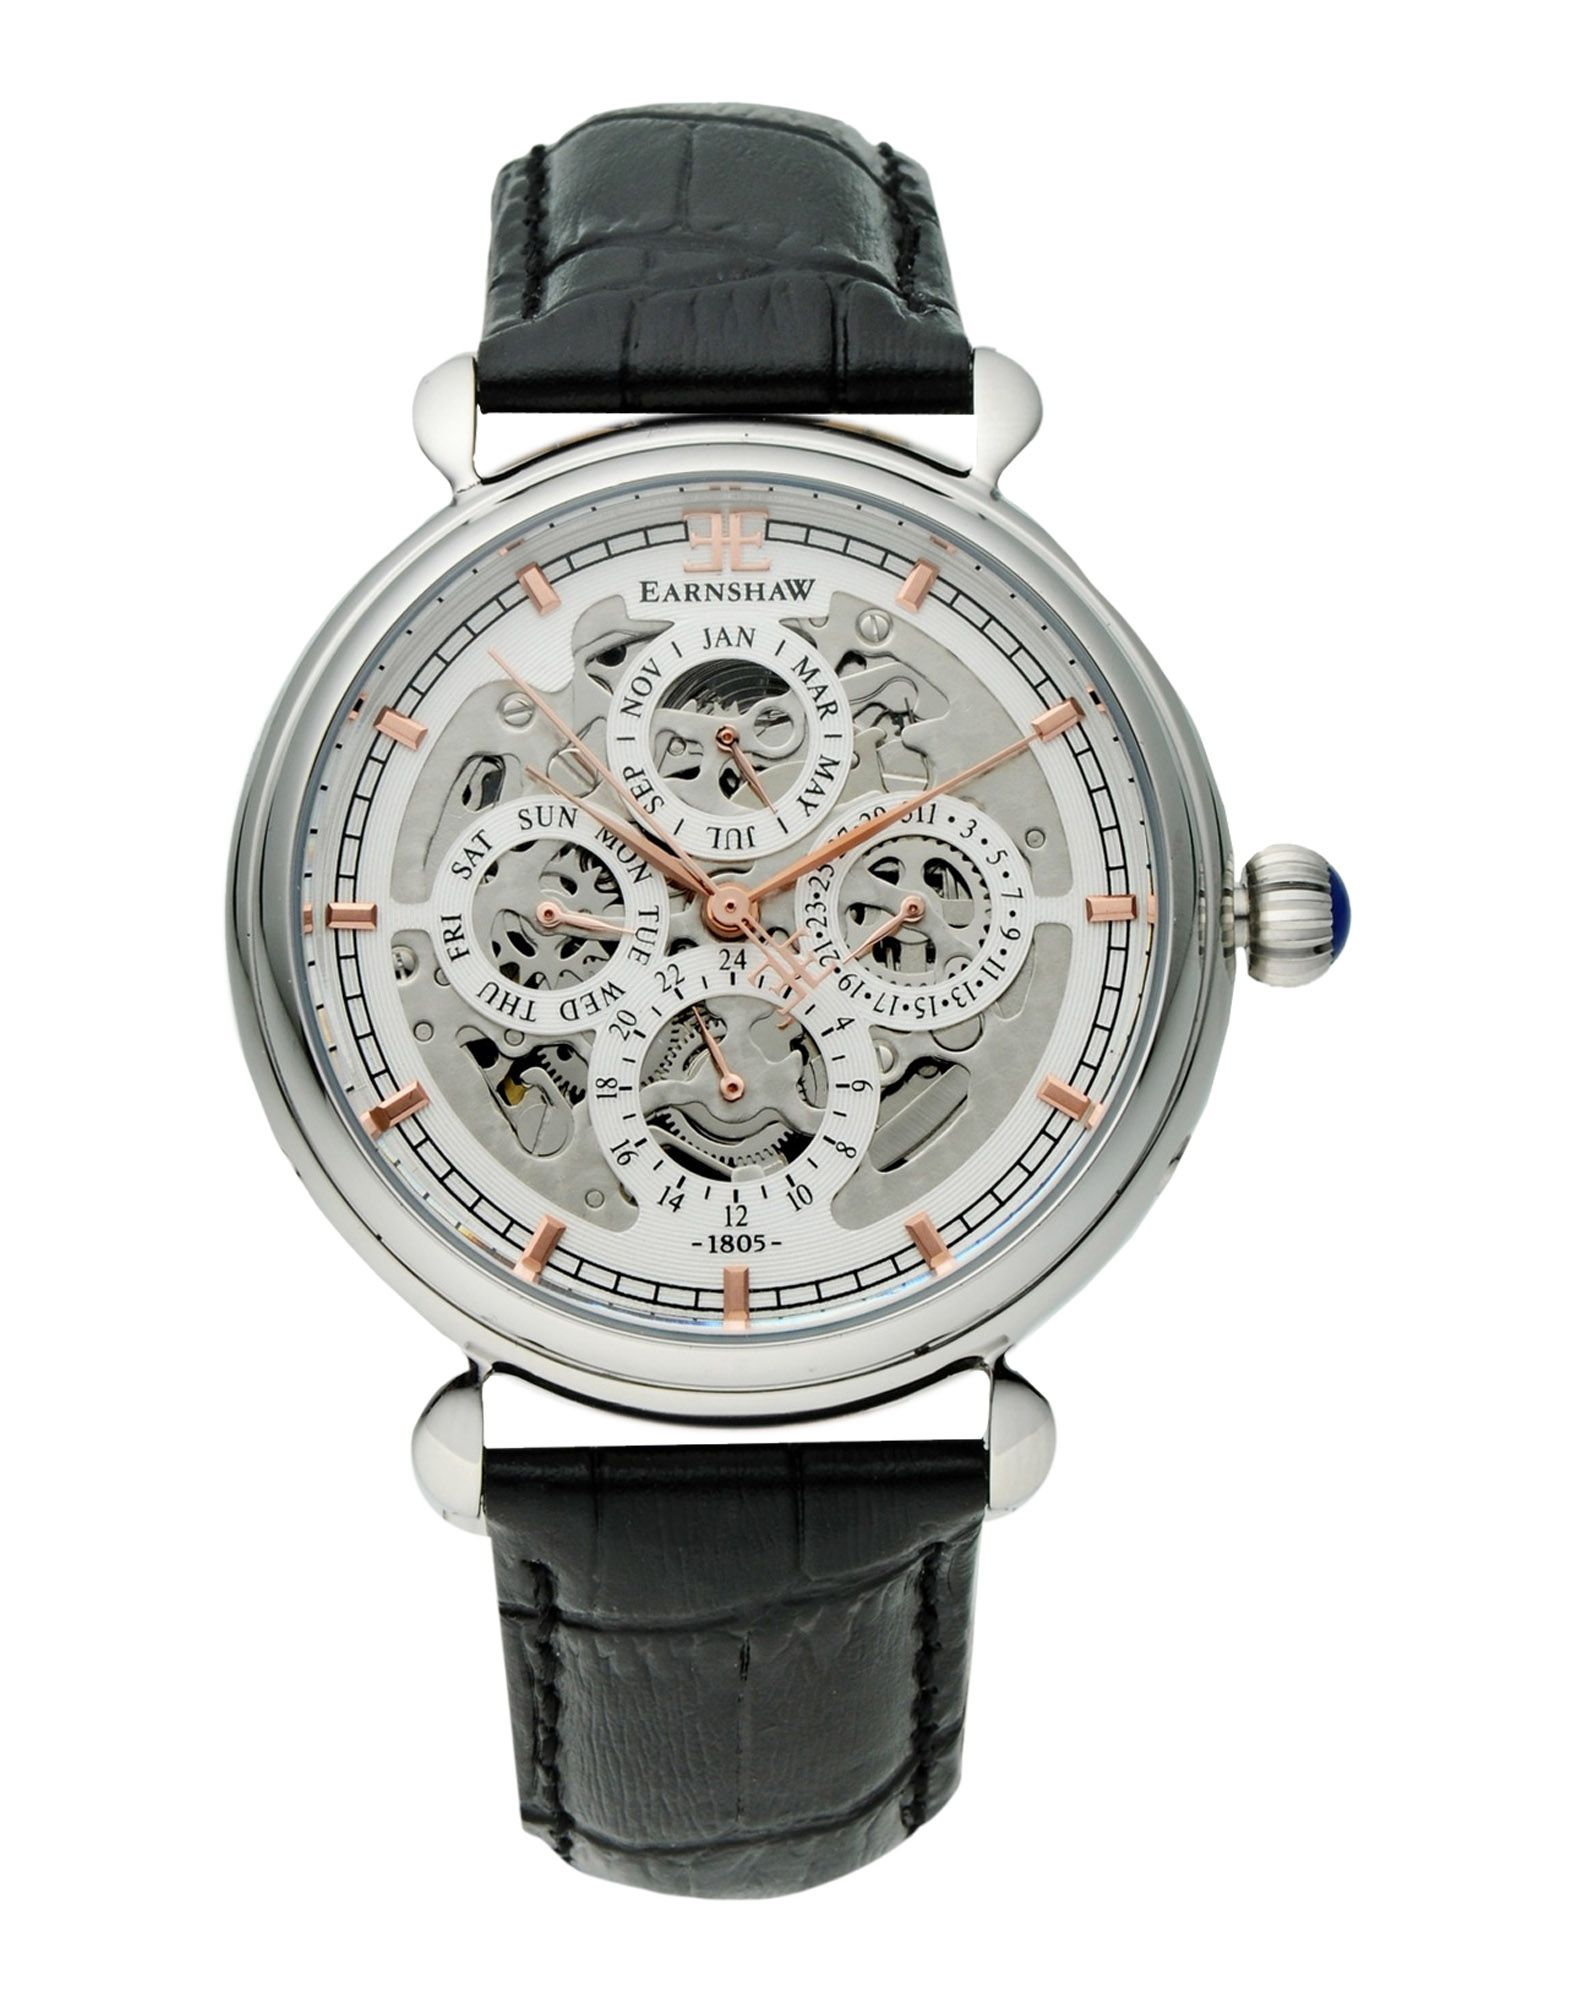 Earnshaw Wrist Watches